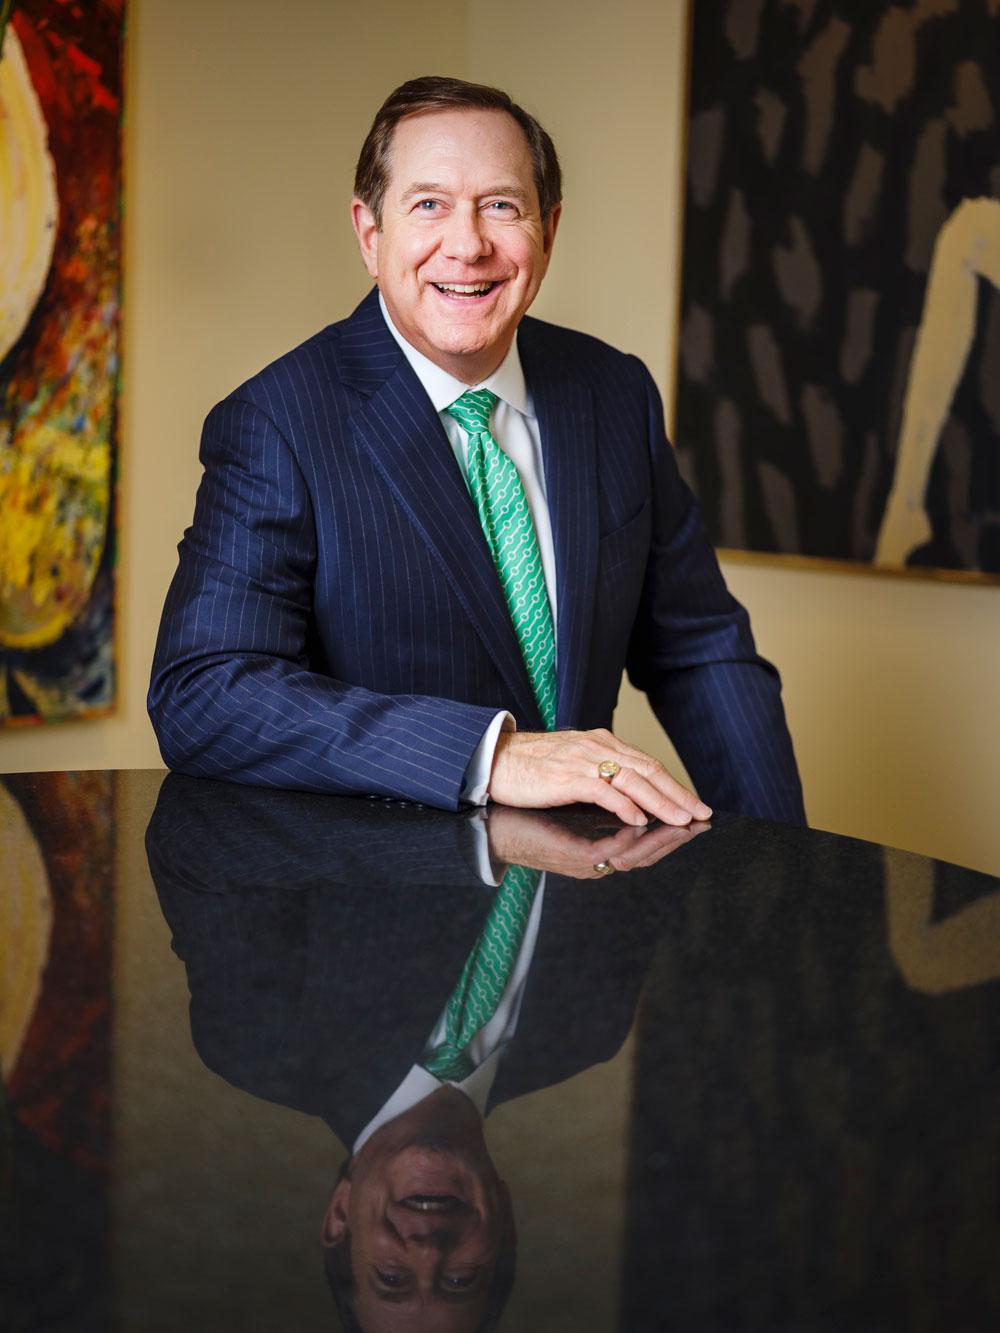 Headshot of Jordan D. Schnitzer, smiling at a black table